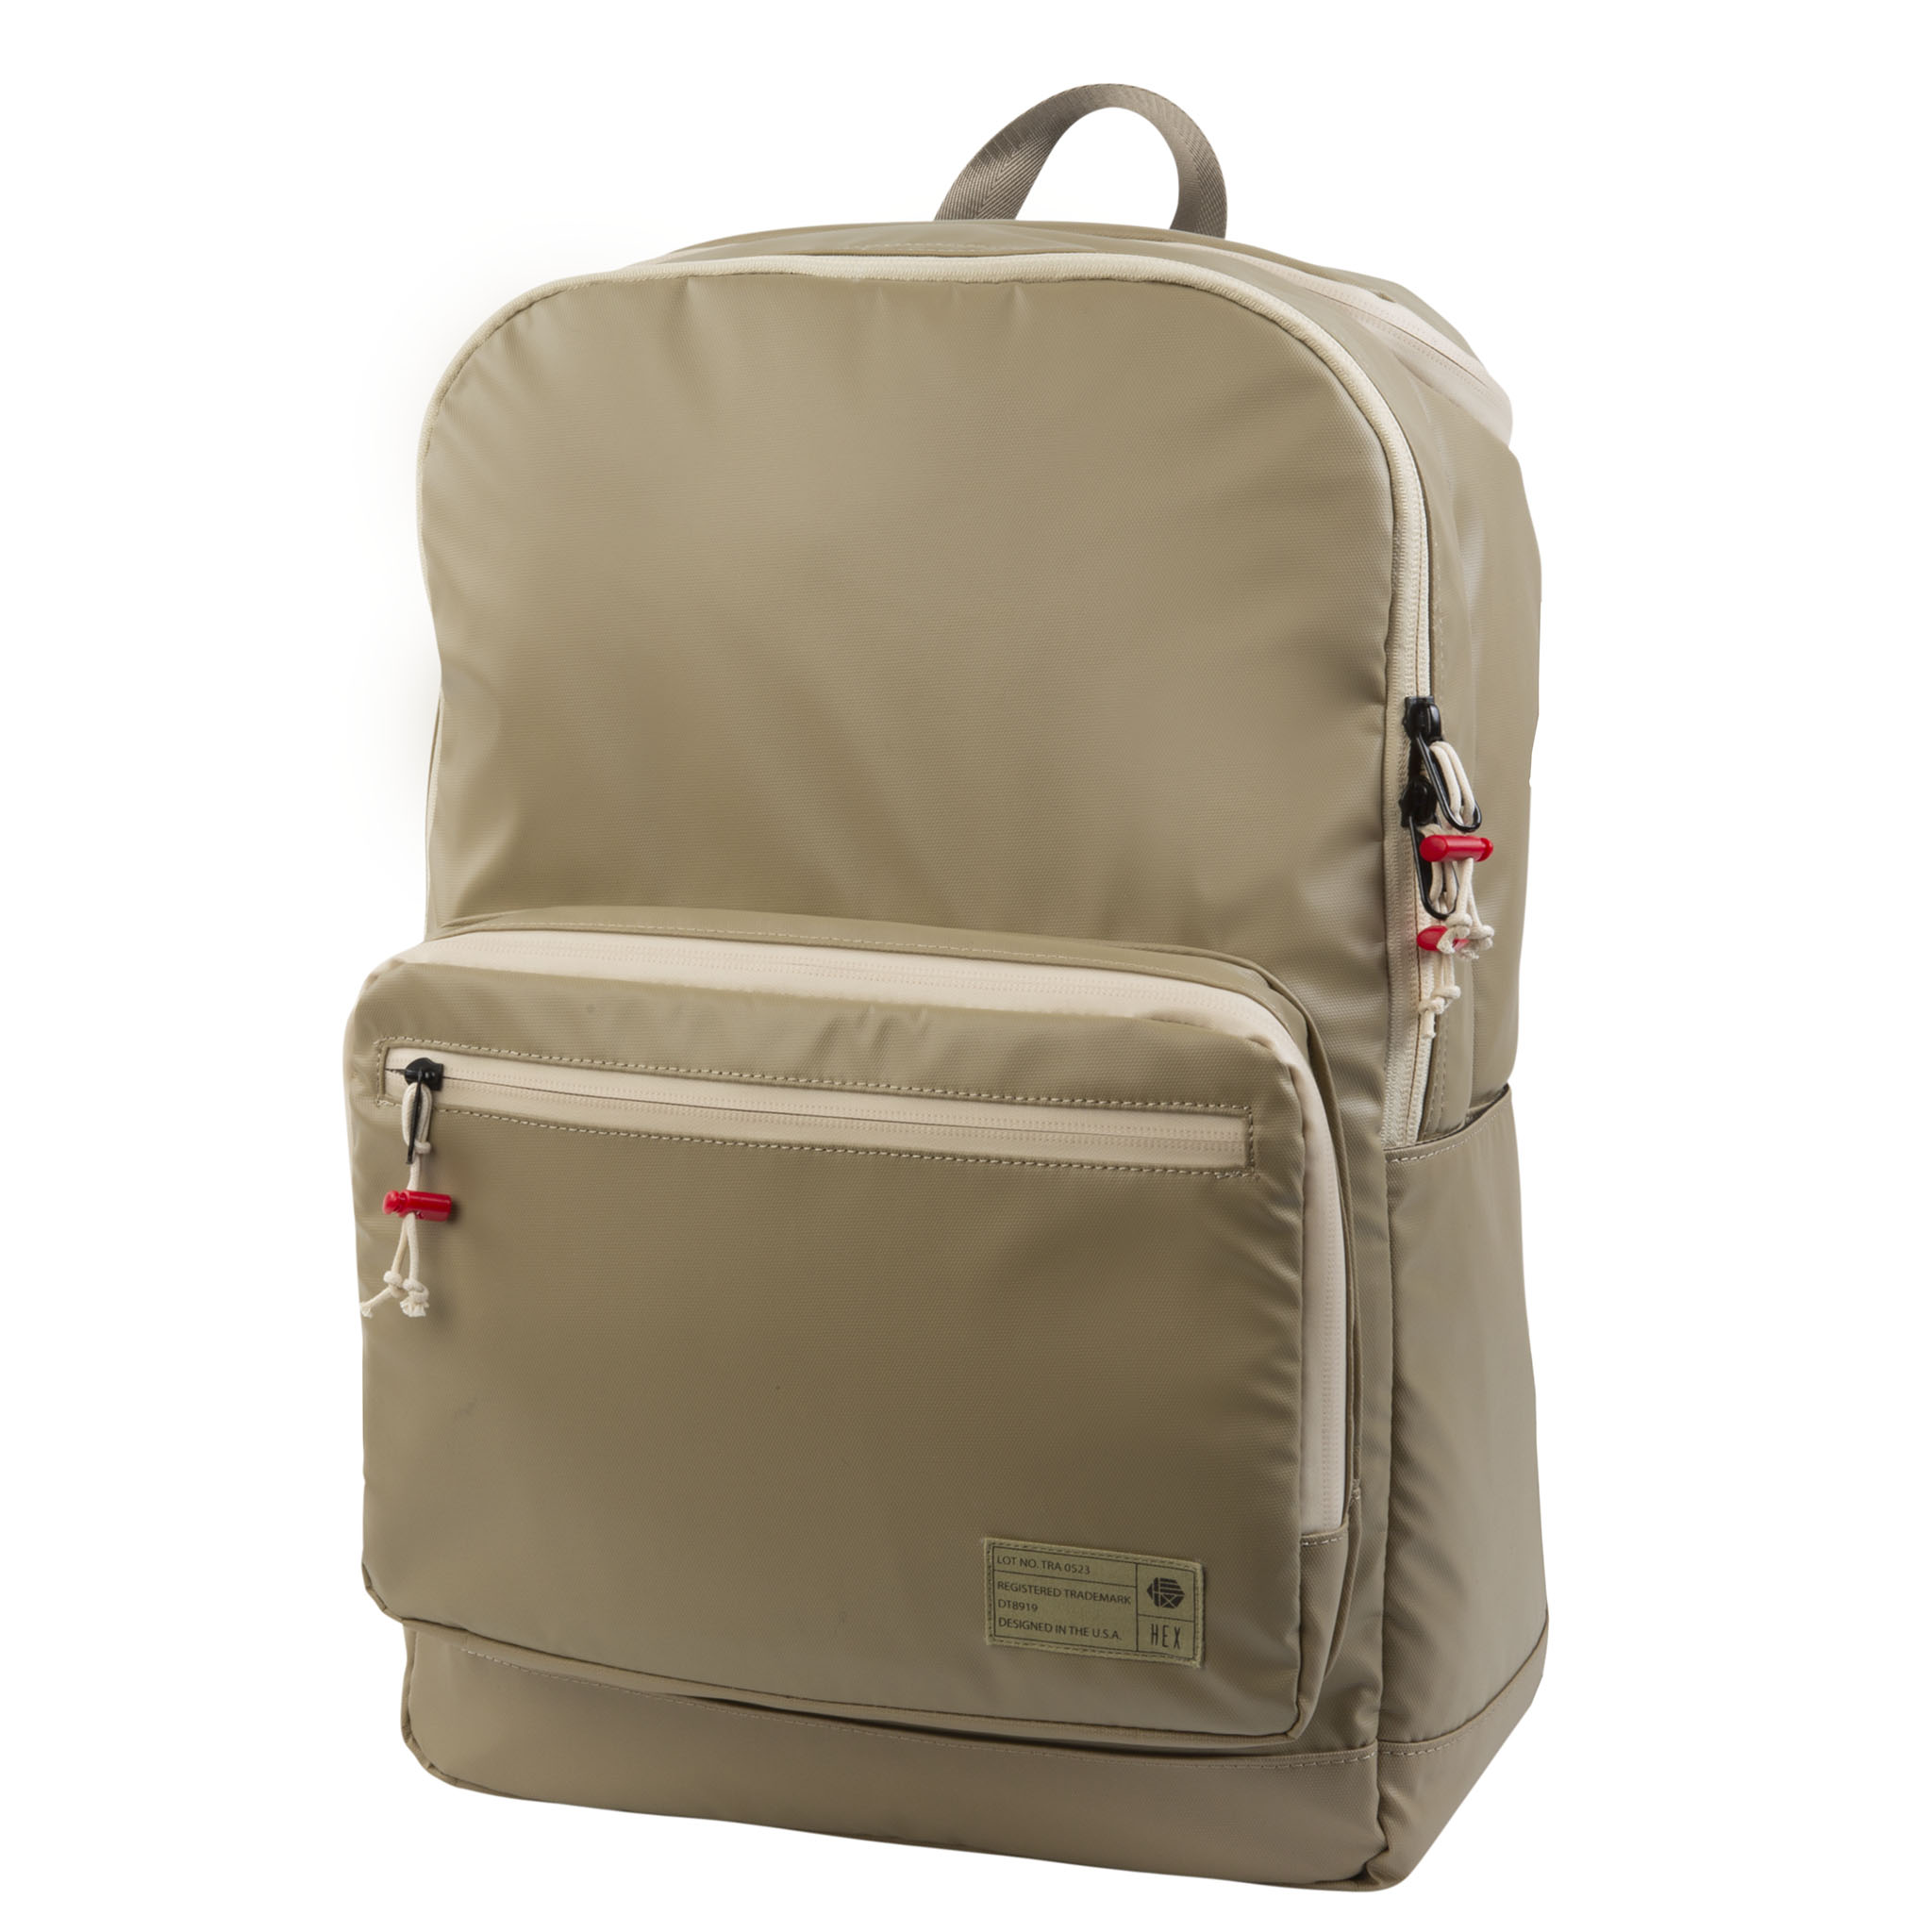 HEX TERRA WET DRY backpack